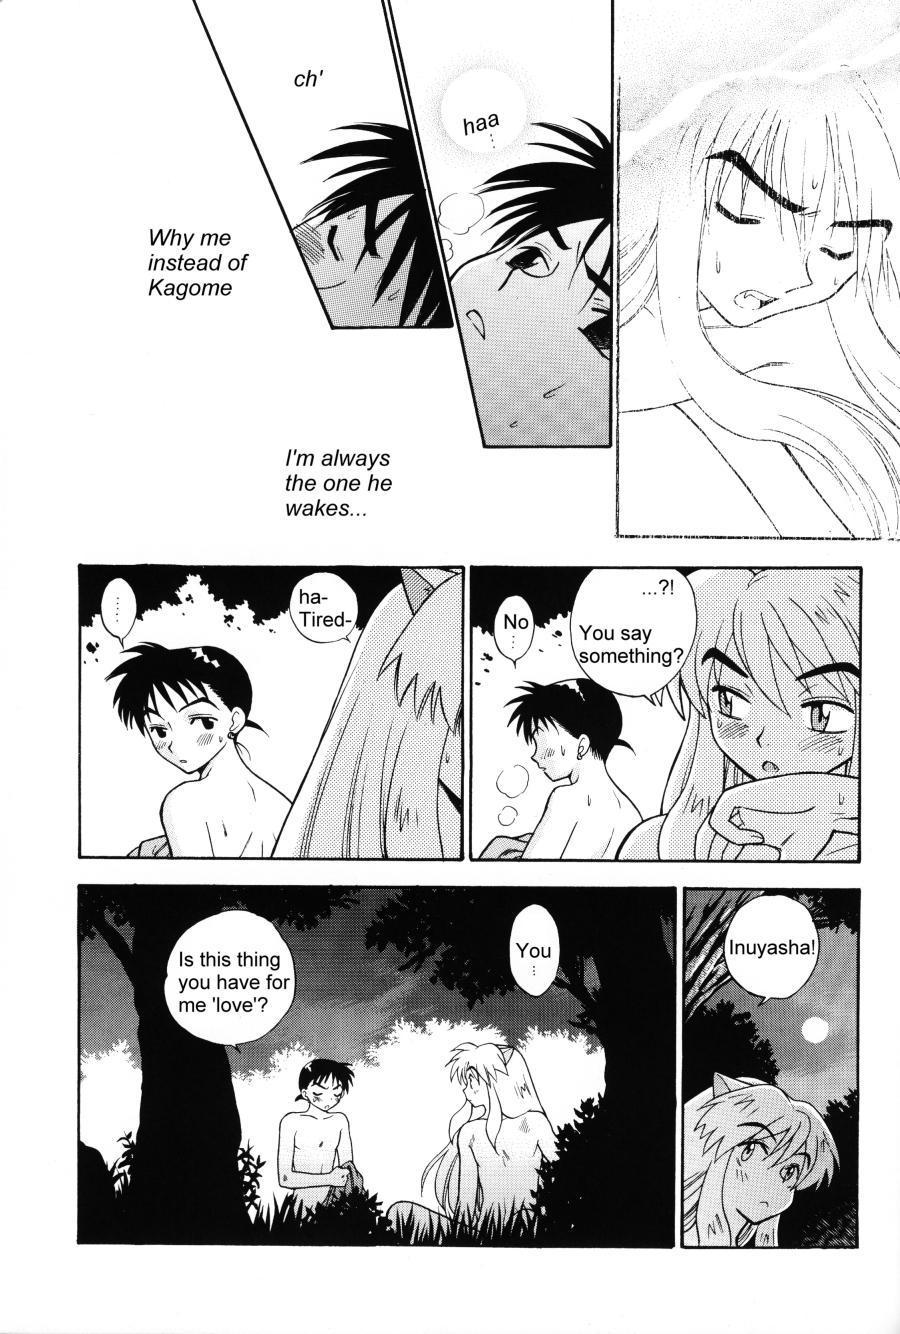 [Masakazu Akagi] Hanaoto [EN] yaoi 25